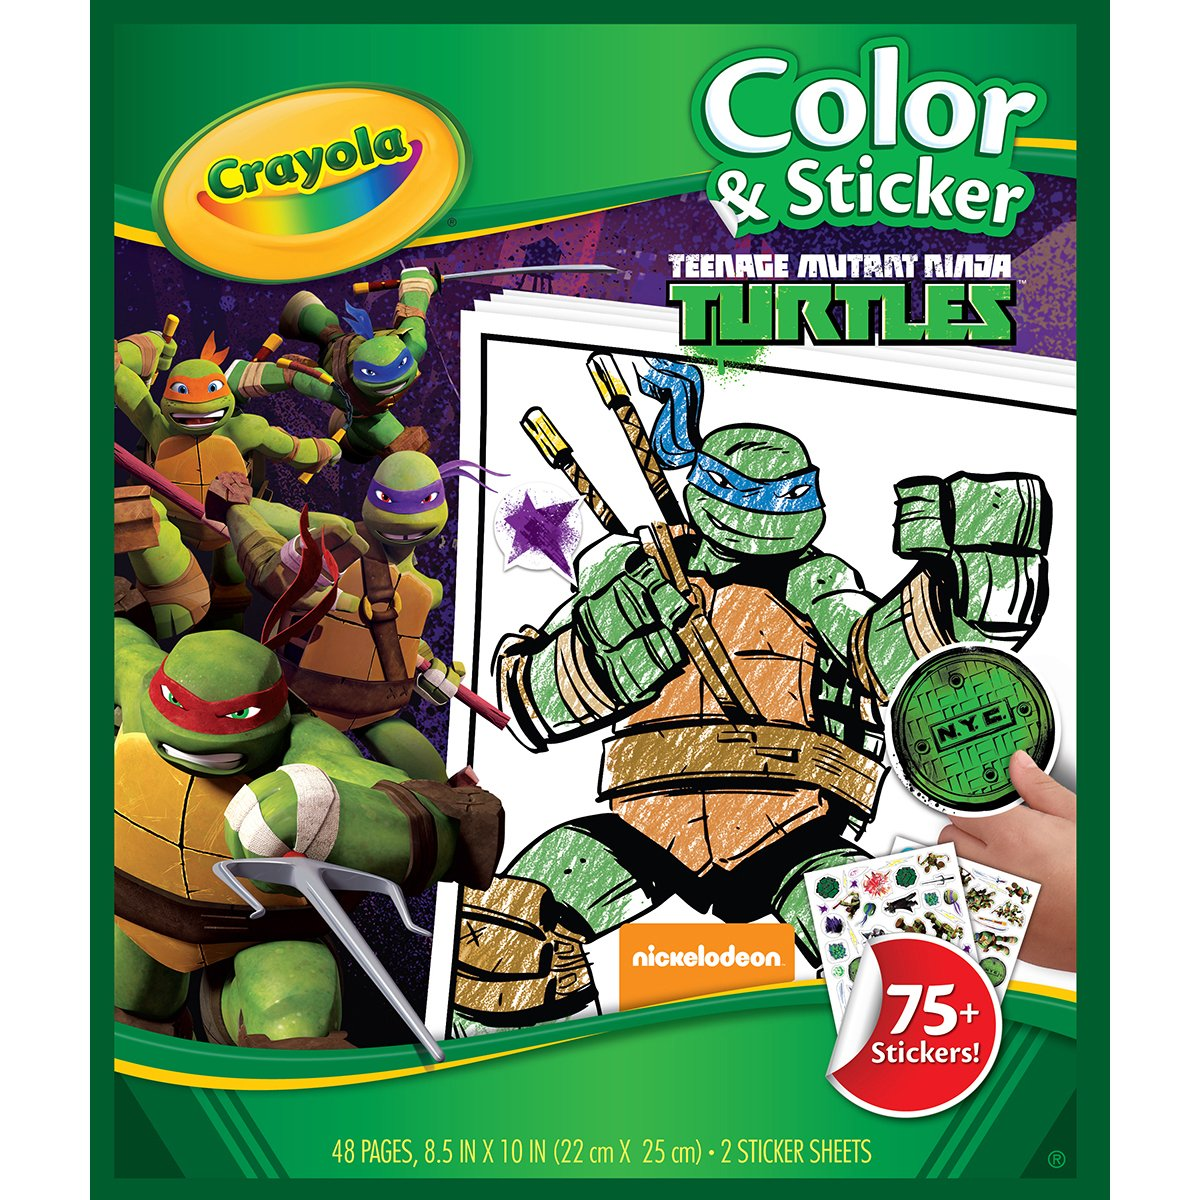 Amazon.com: Crayola Teenage Mutant Ninja Turtles Color \'n Sticker ...